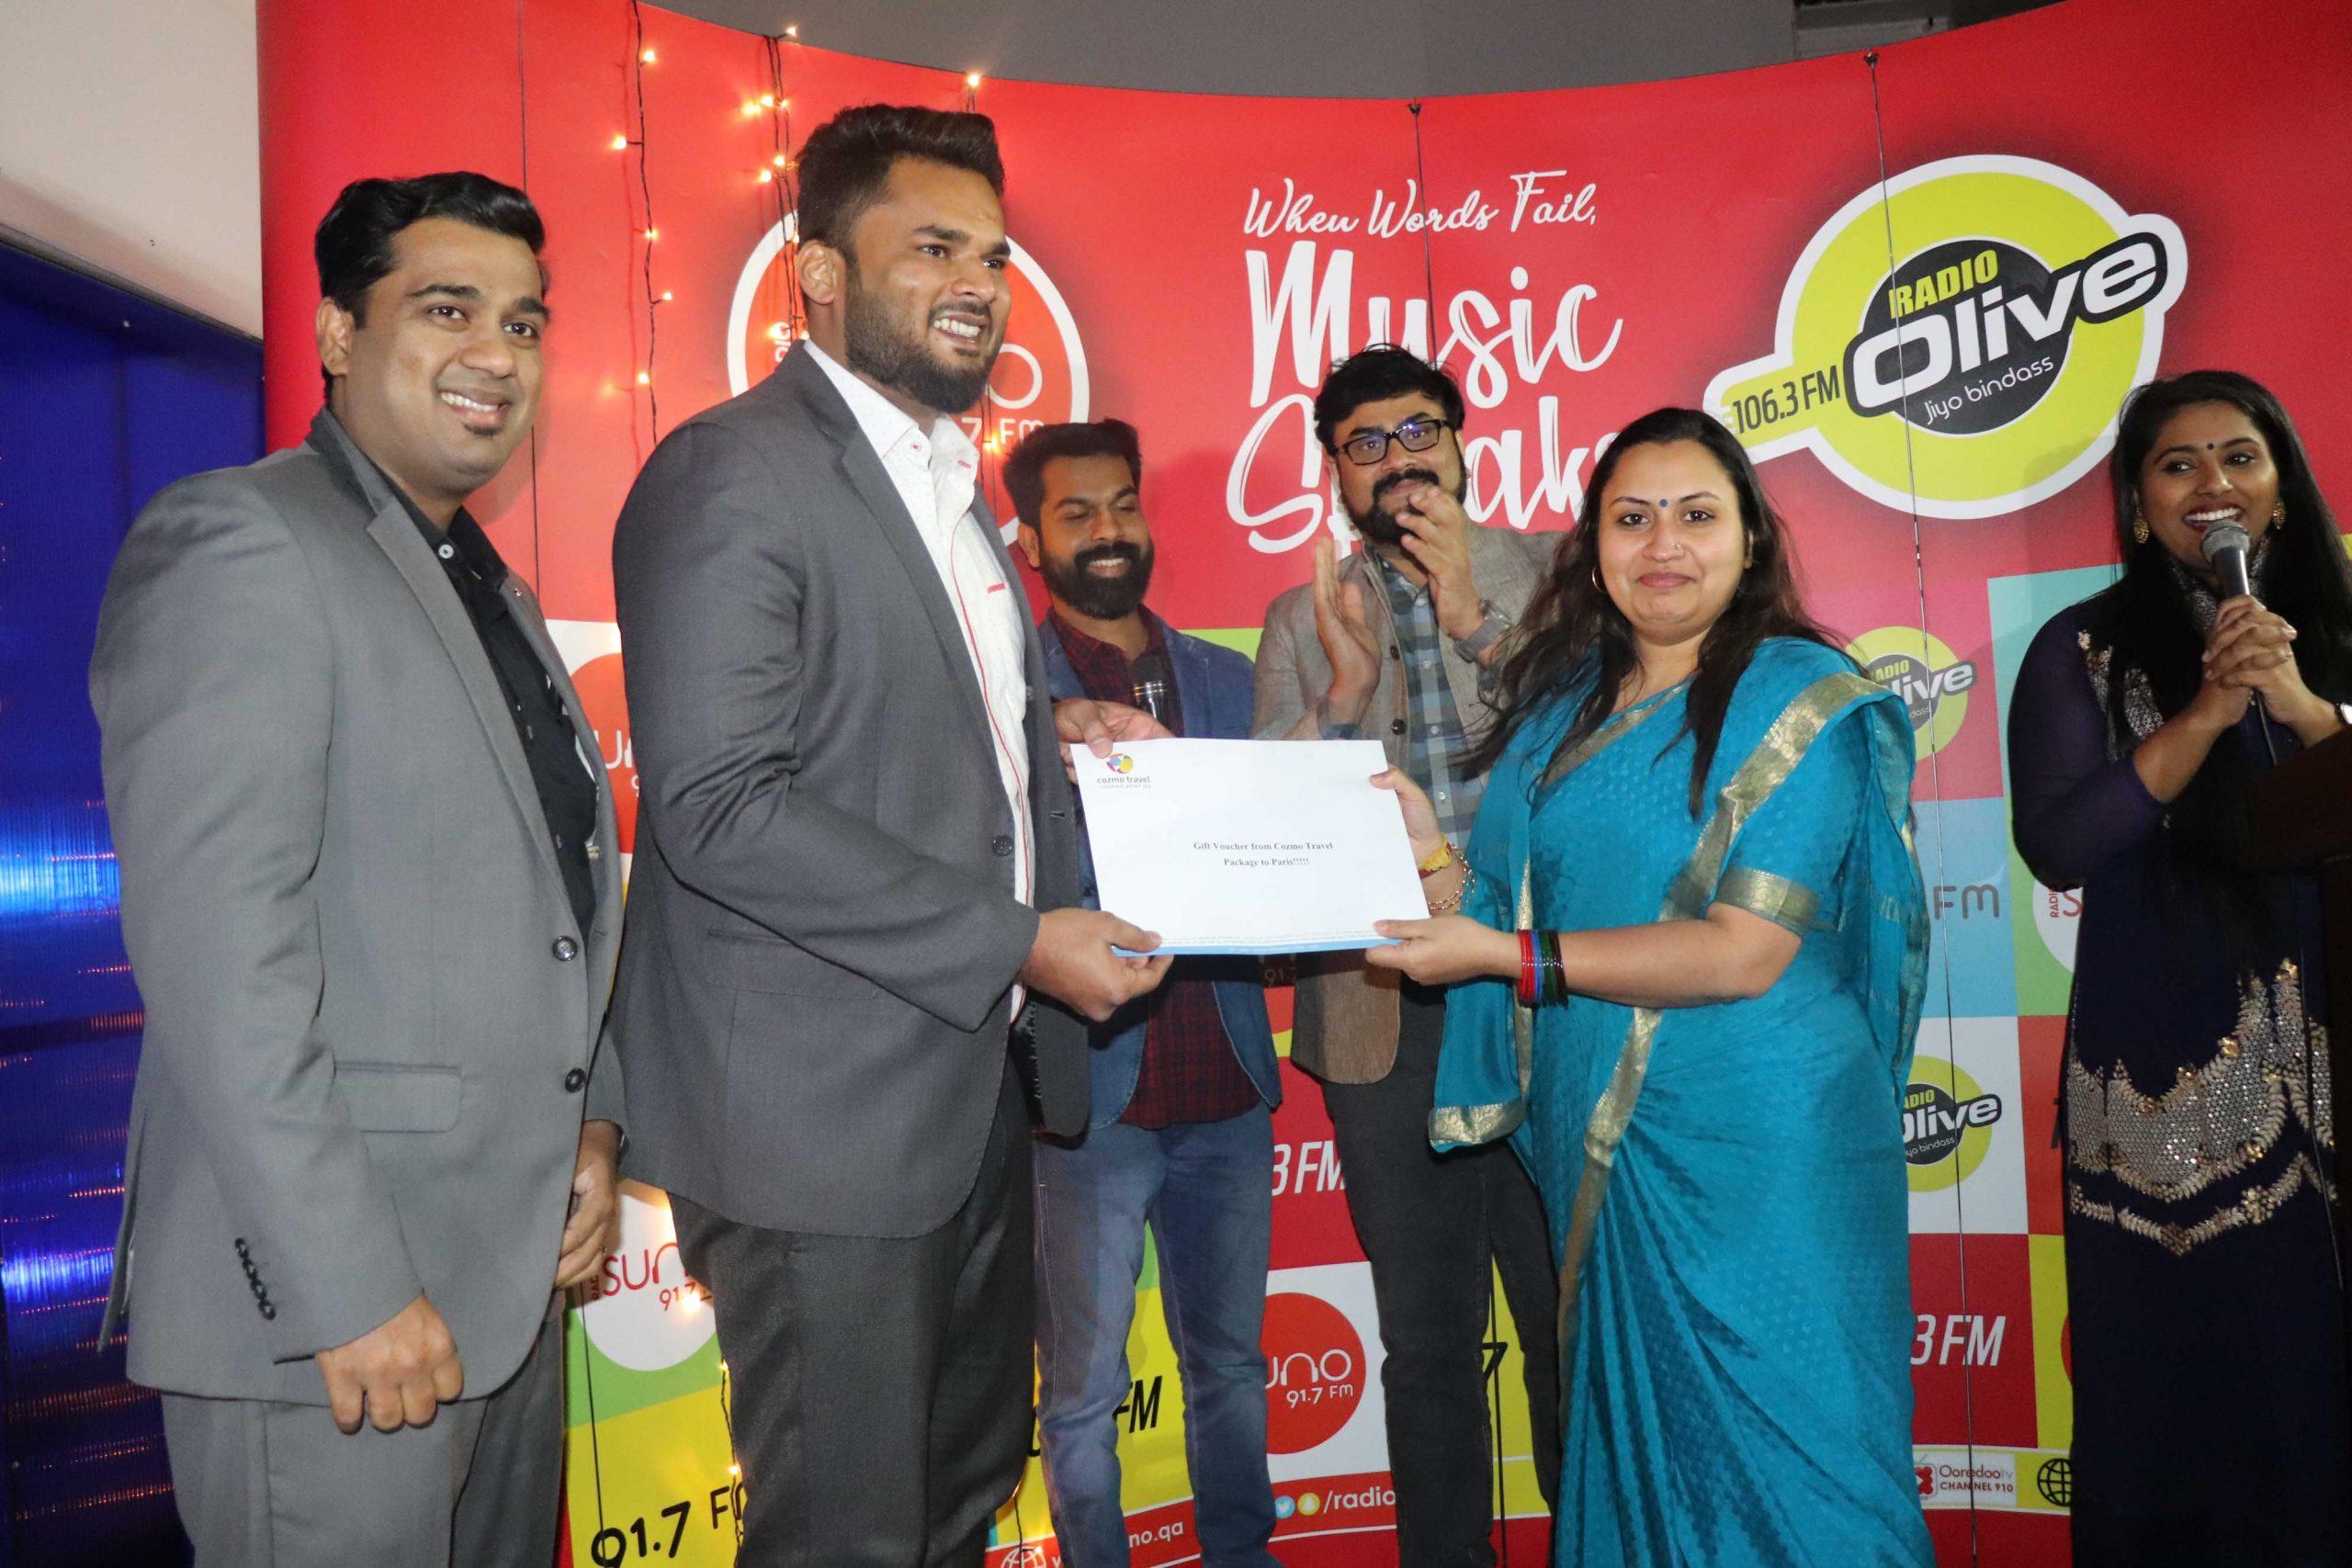 Suno Genie Contest Winner Asha Jawhar